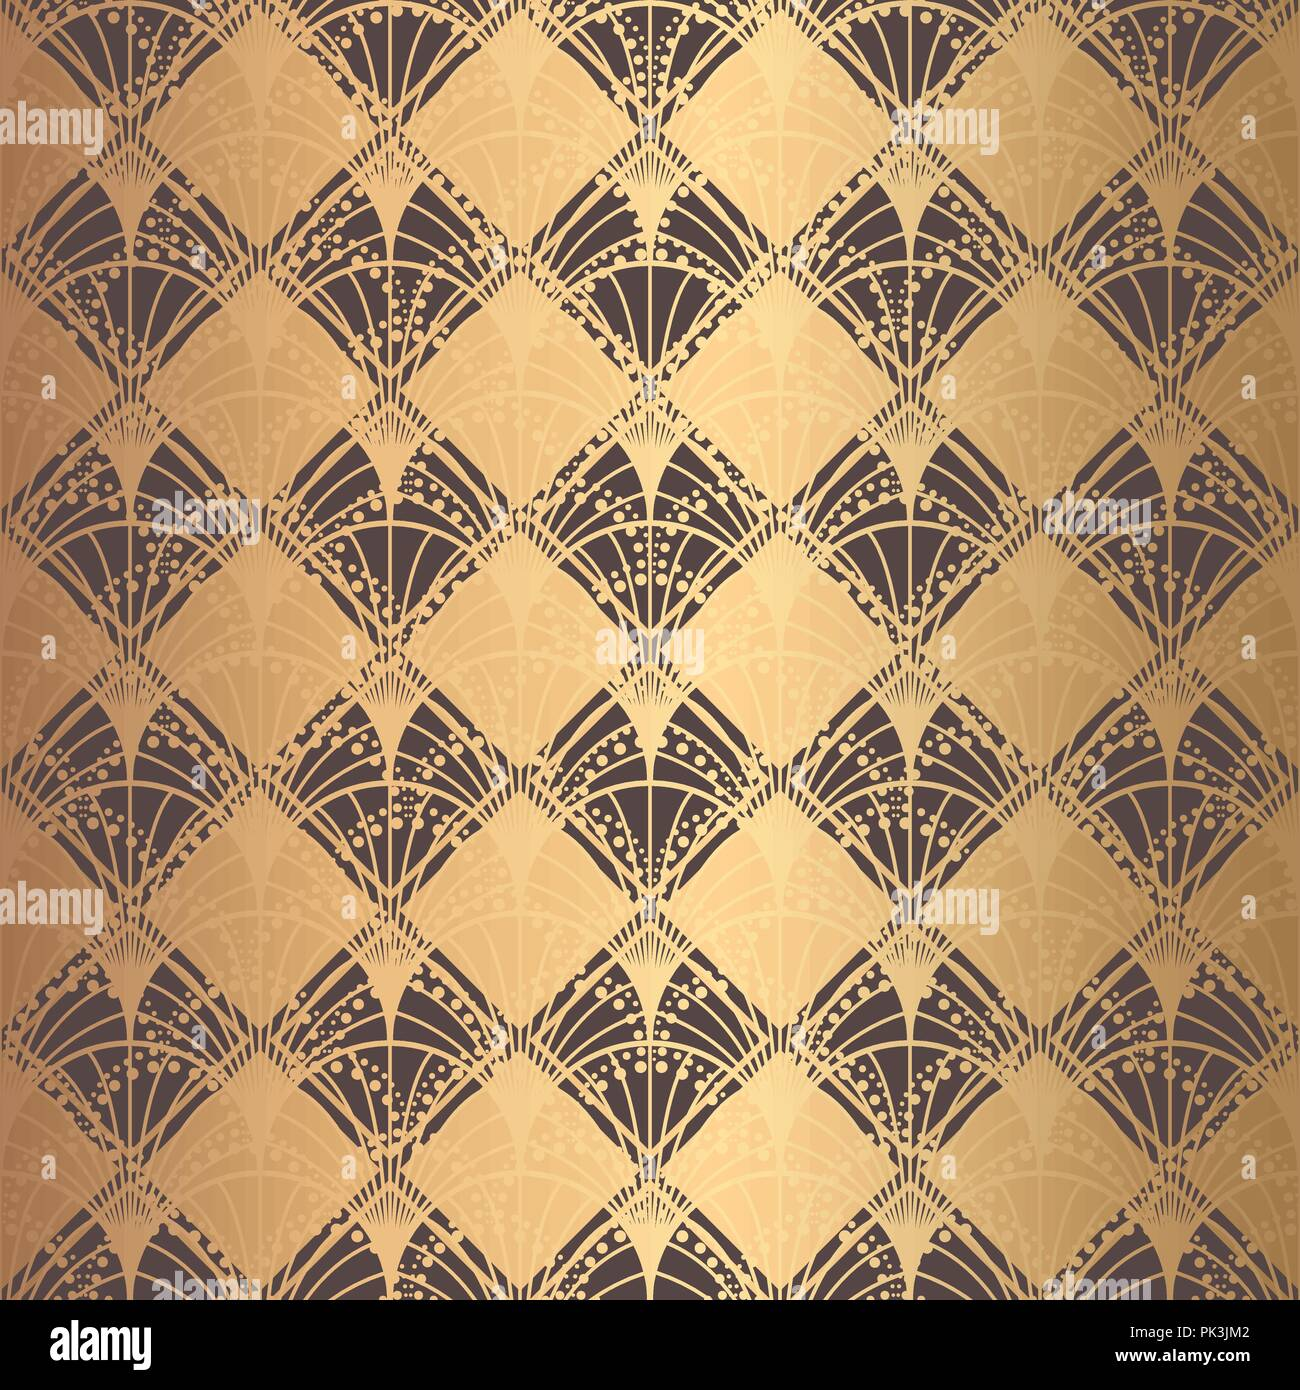 Irregular Art Deco Pattern Golden Background Scales - Stock Vector